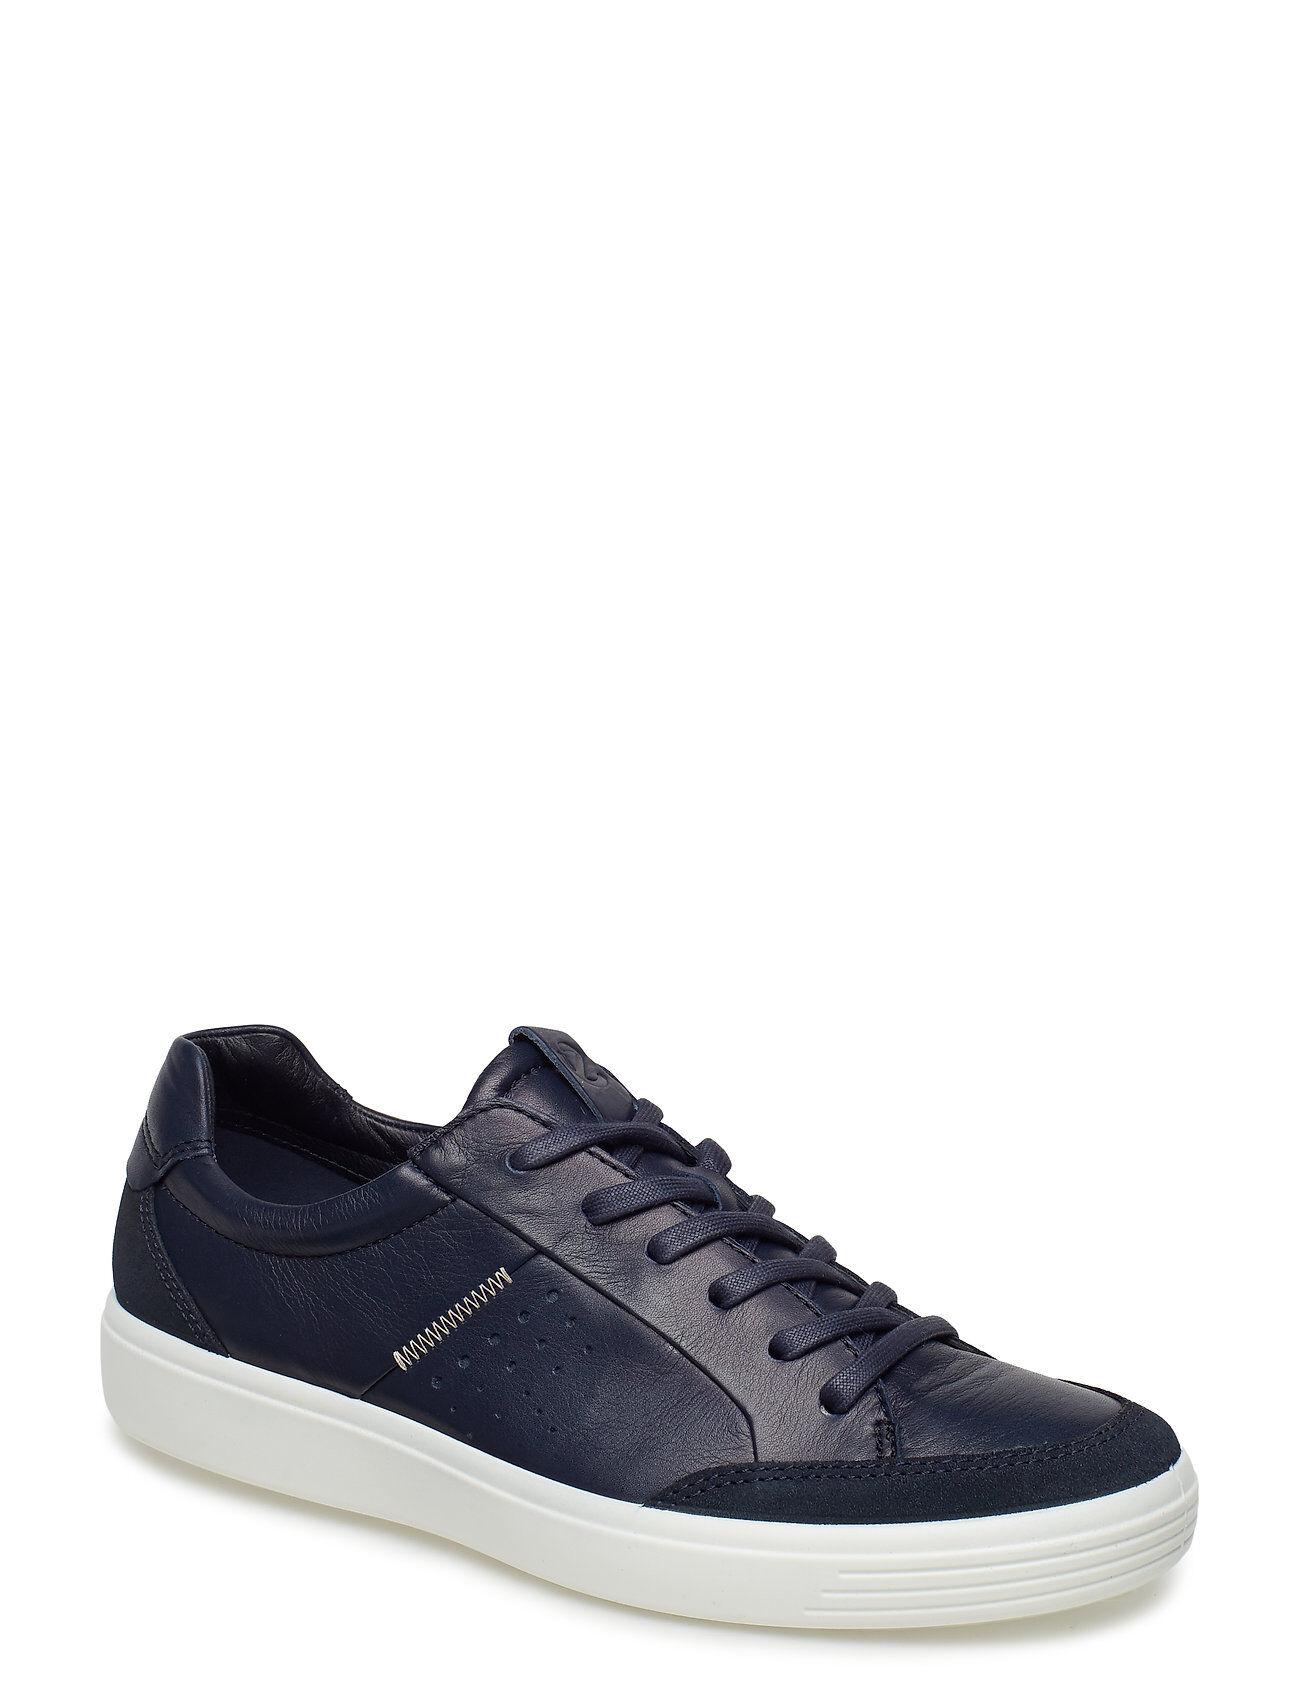 ECCO Soft 7 M Matalavartiset Sneakerit Tennarit Sininen ECCO